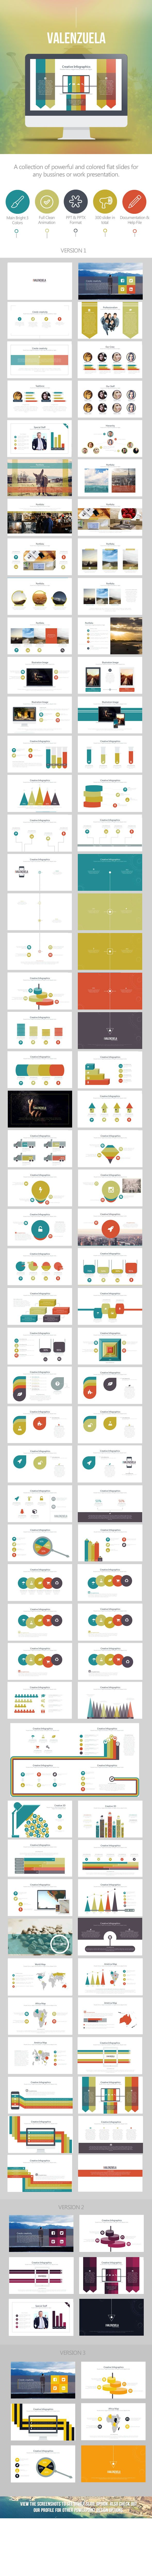 Valenzuela PP - PowerPoint Templates Presentation Templates